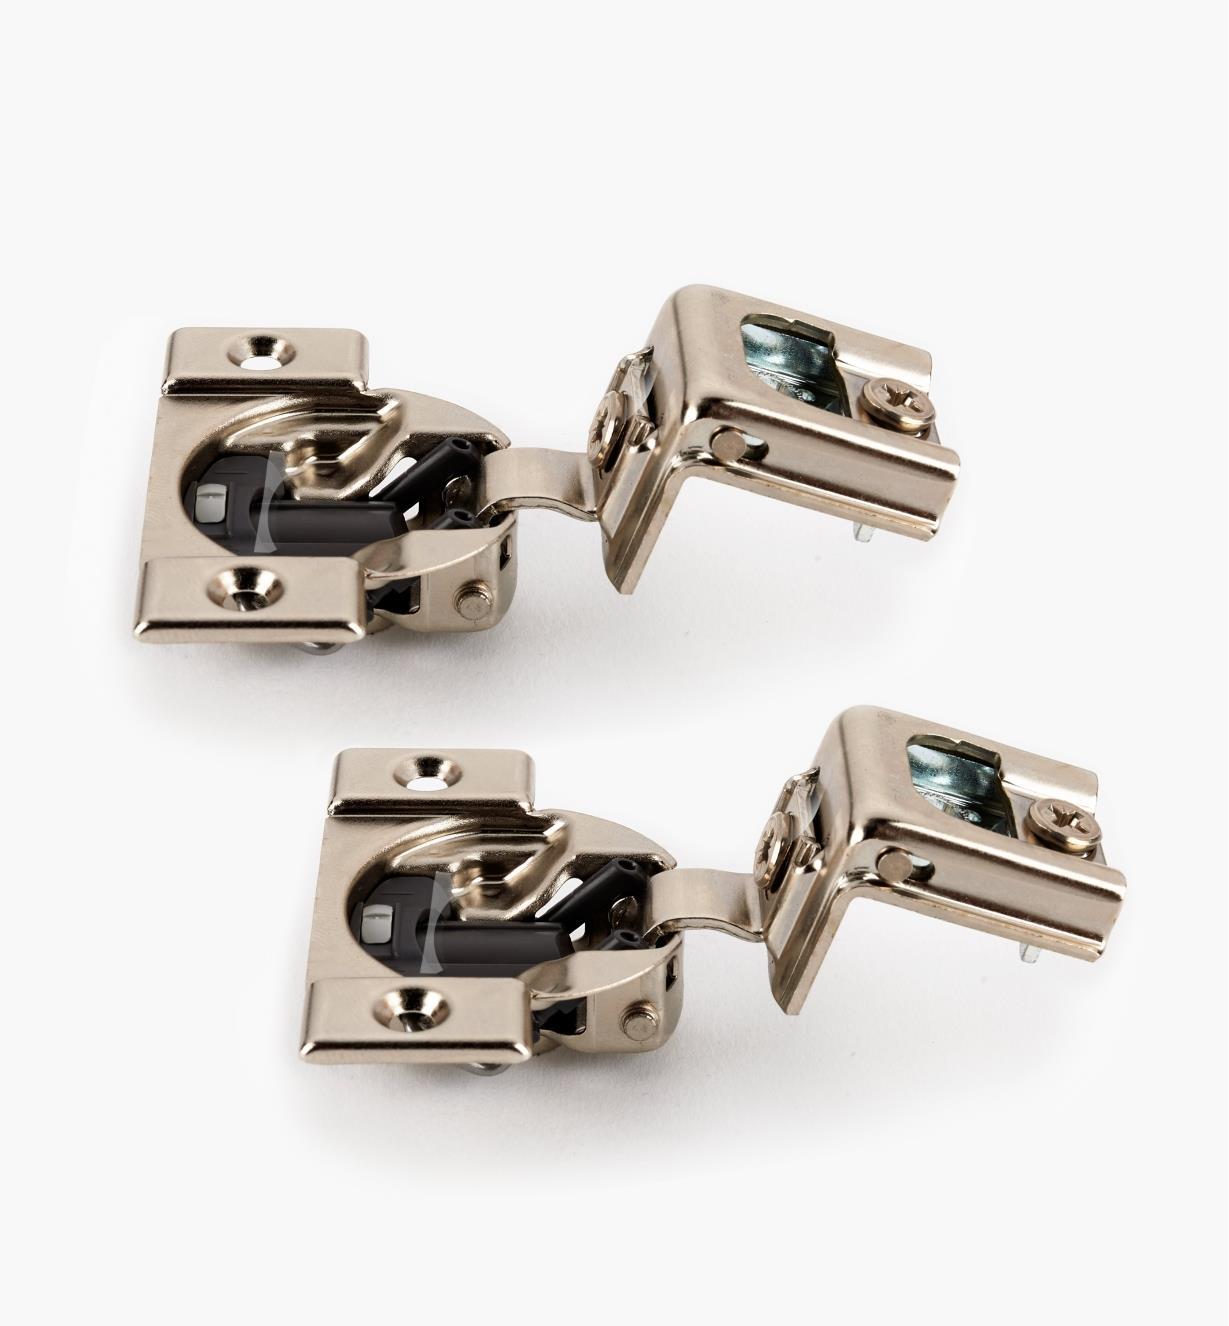 00B1815 - Compact Blumotion 110° Overlay Hinge, pair